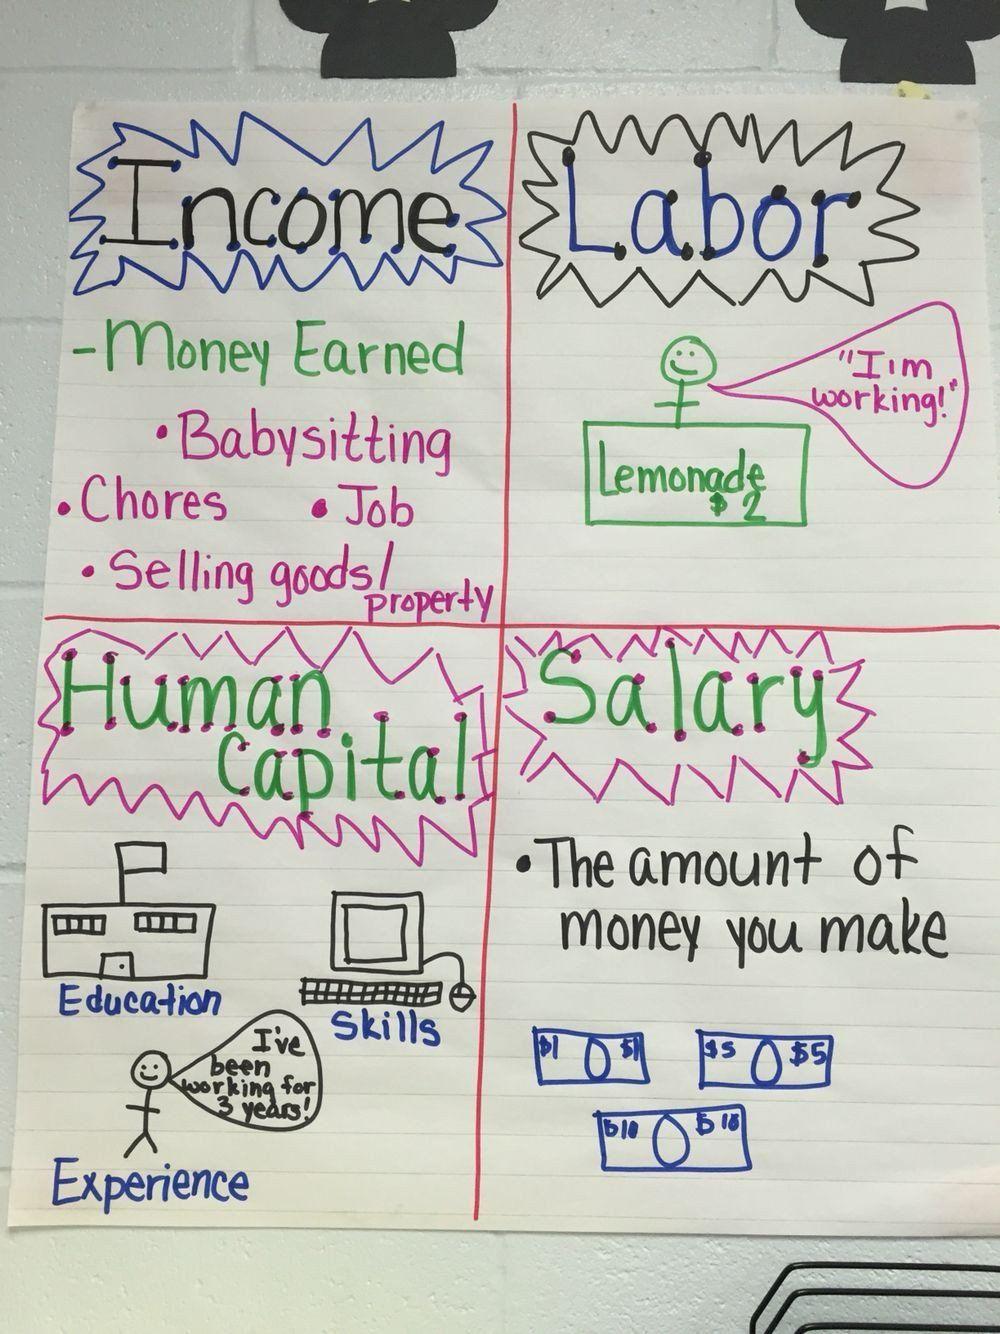 7th Grade Financial Literacy Worksheets Personal Financial L… in 2020    Personal financial literacy [ 1334 x 1000 Pixel ]